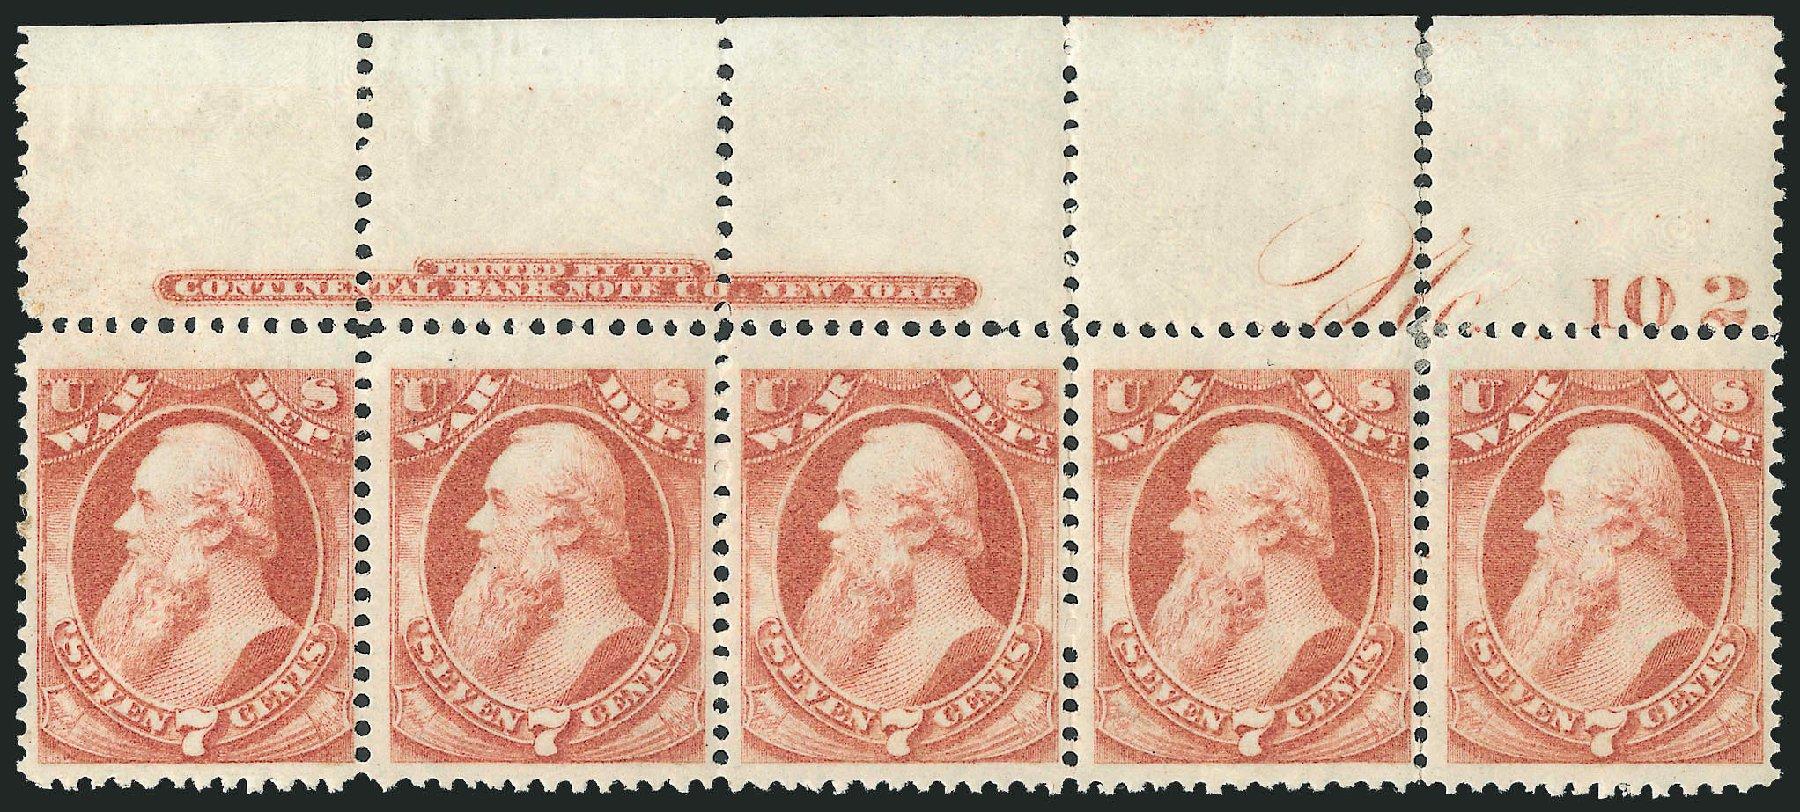 US Stamps Value Scott Catalogue # O87 - 1873 7c War Official. Robert Siegel Auction Galleries, Dec 2010, Sale 1003, Lot 5466